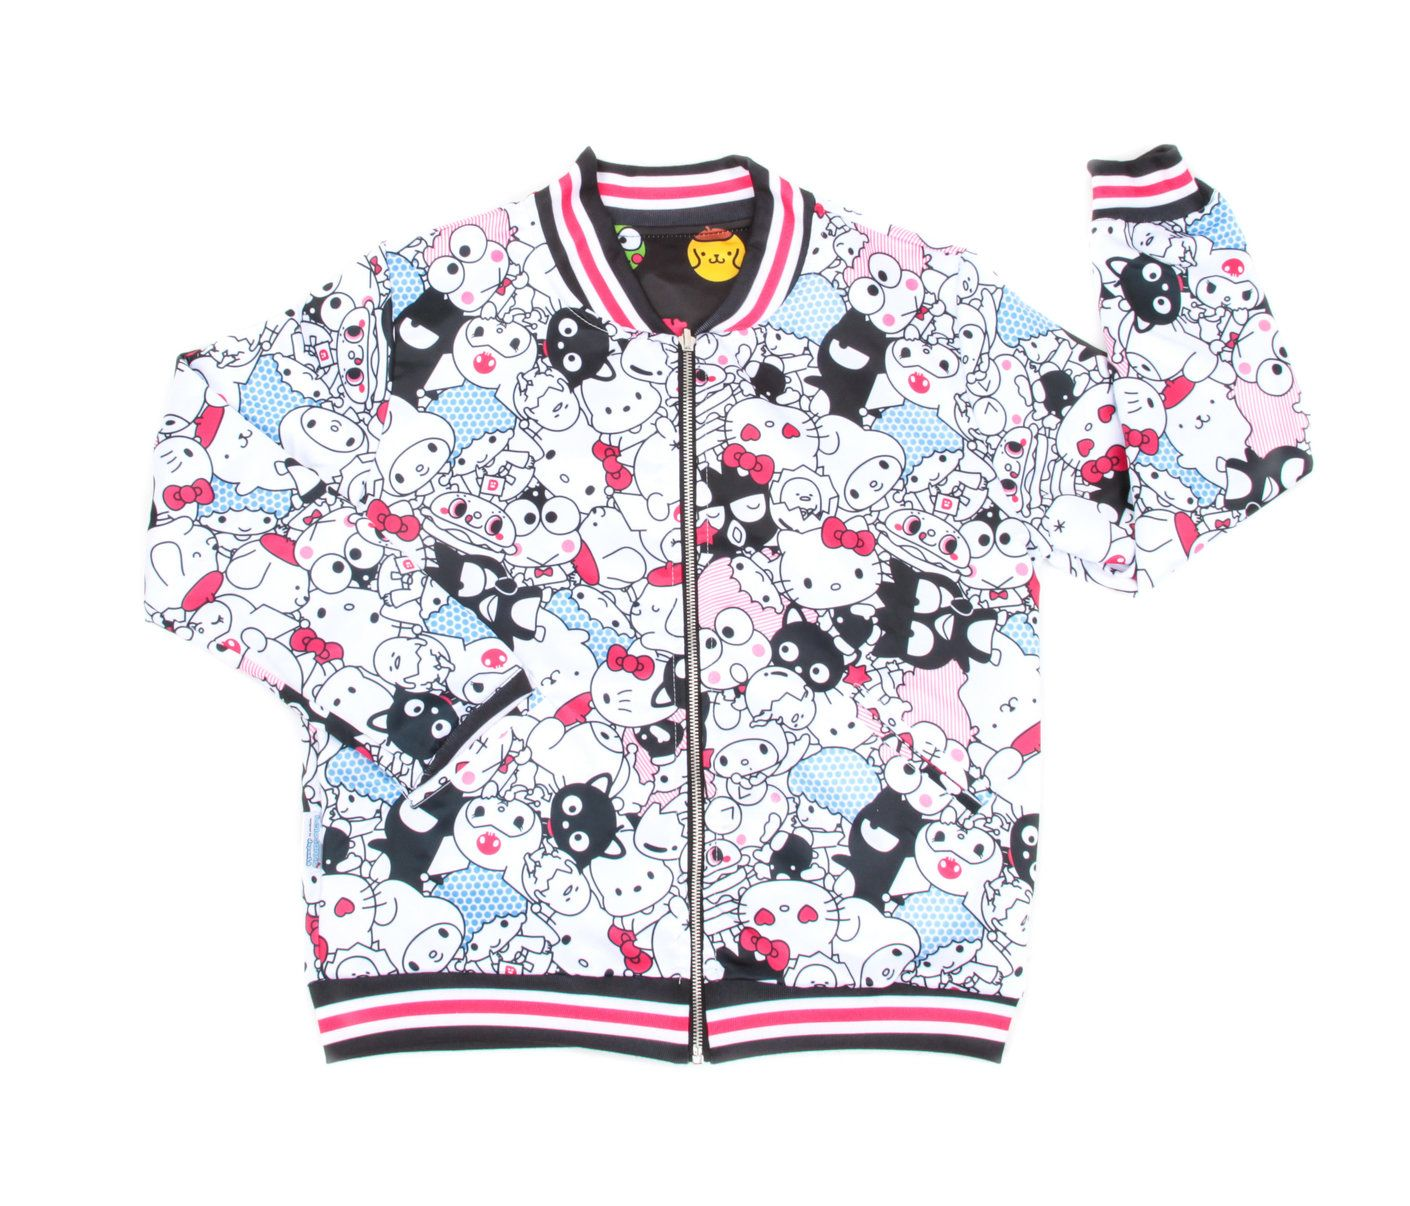 Sanrio Characters Reversible Bomber Jacket Hello Sanrio Sanrio Girls Bomber Jacket Satin Bomber Jacket Bomber Jacket [ 1206 x 1410 Pixel ]